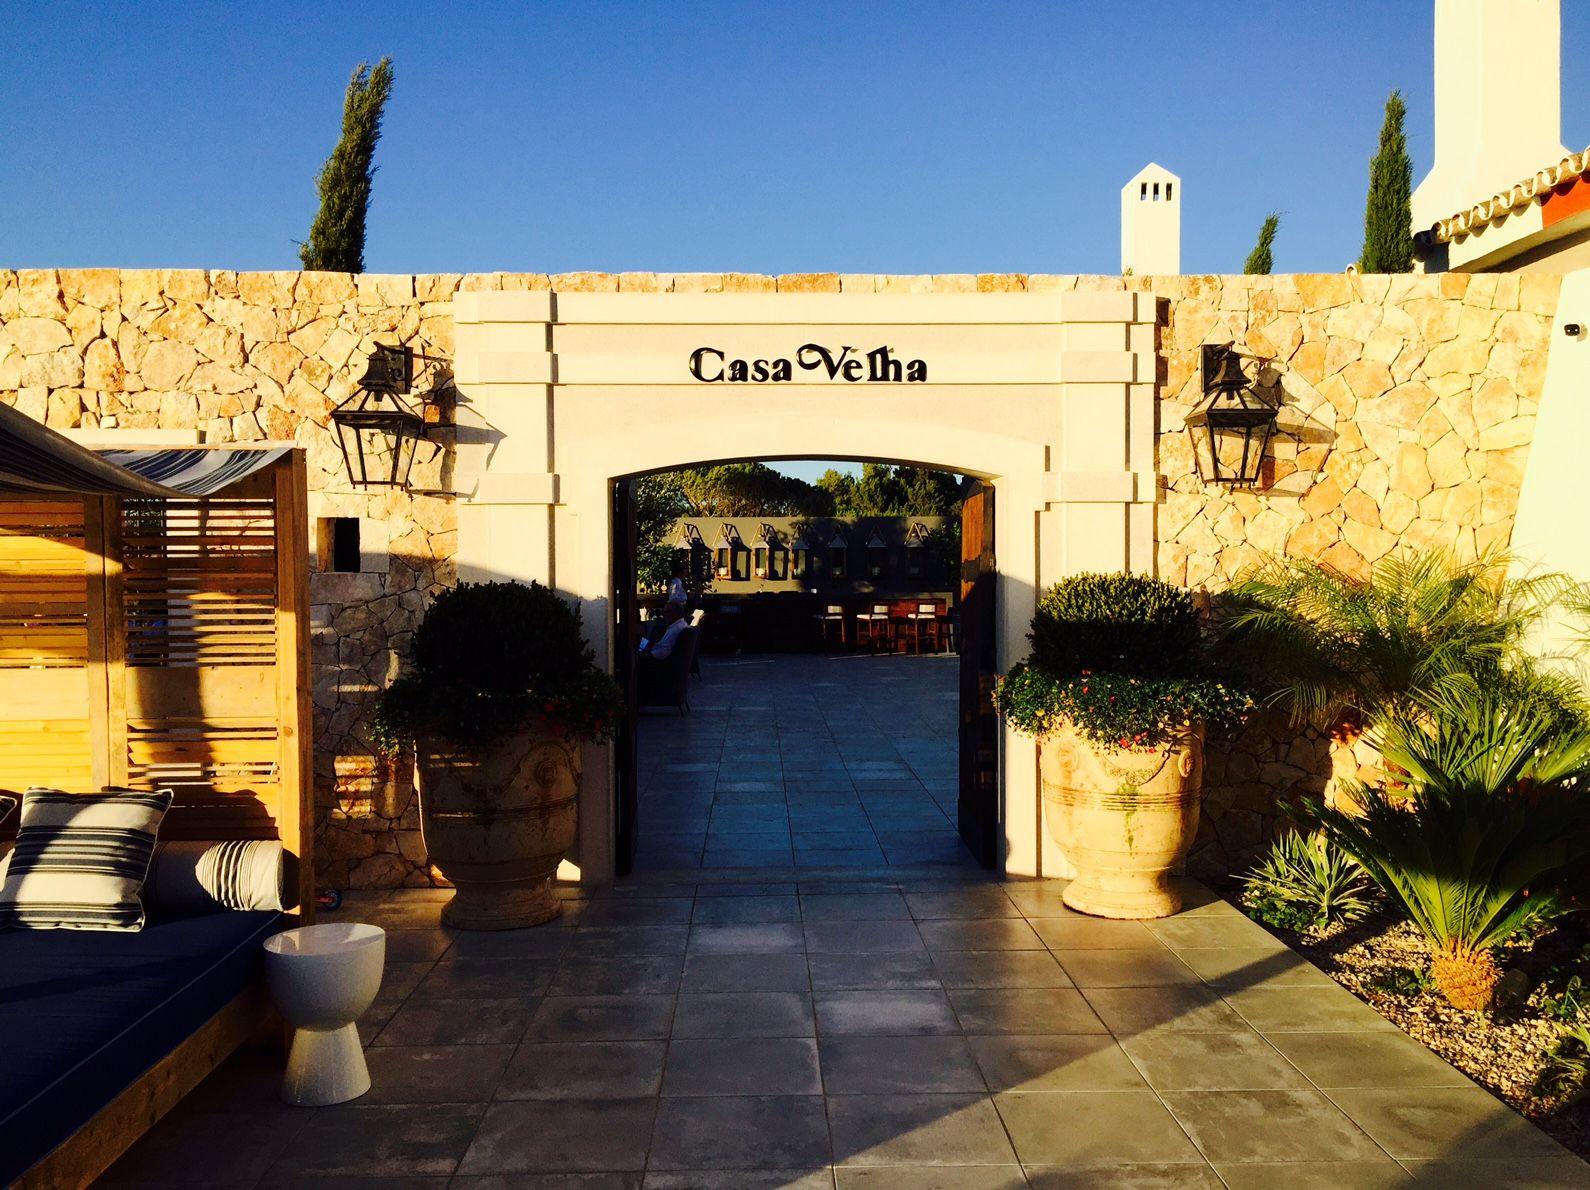 Casa Velha Restaurant Quinta do lago, Algarve Google